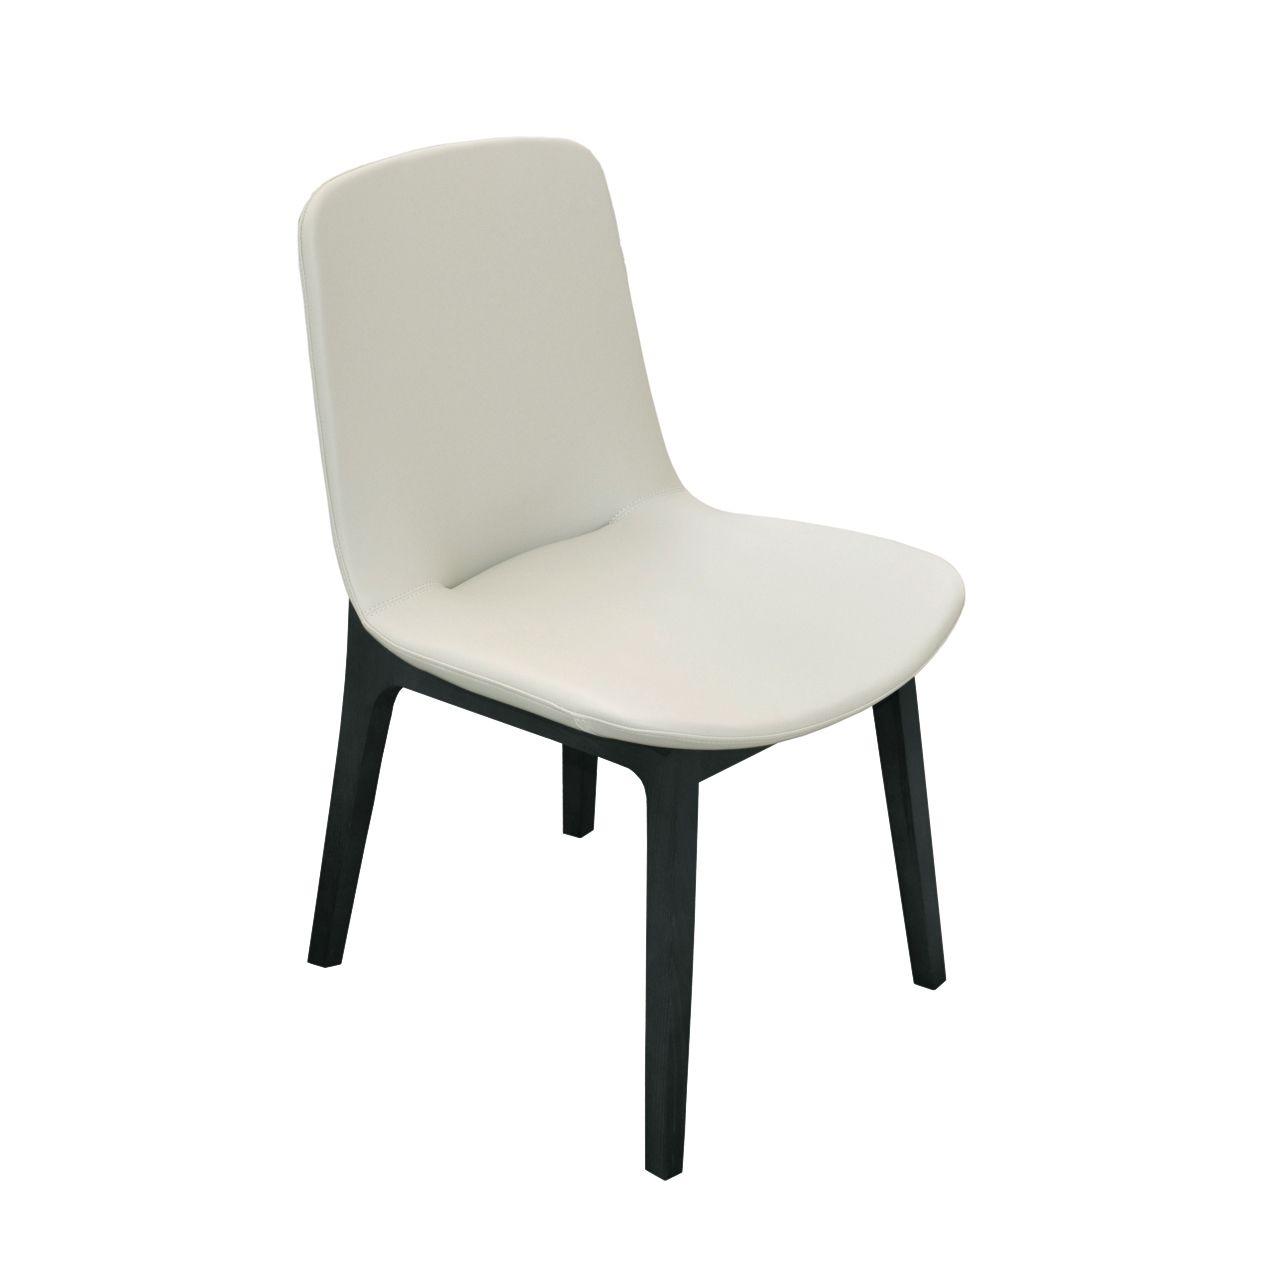 Zara Dining Chair Black Matt Legs Dining Chairs Chair Furniture